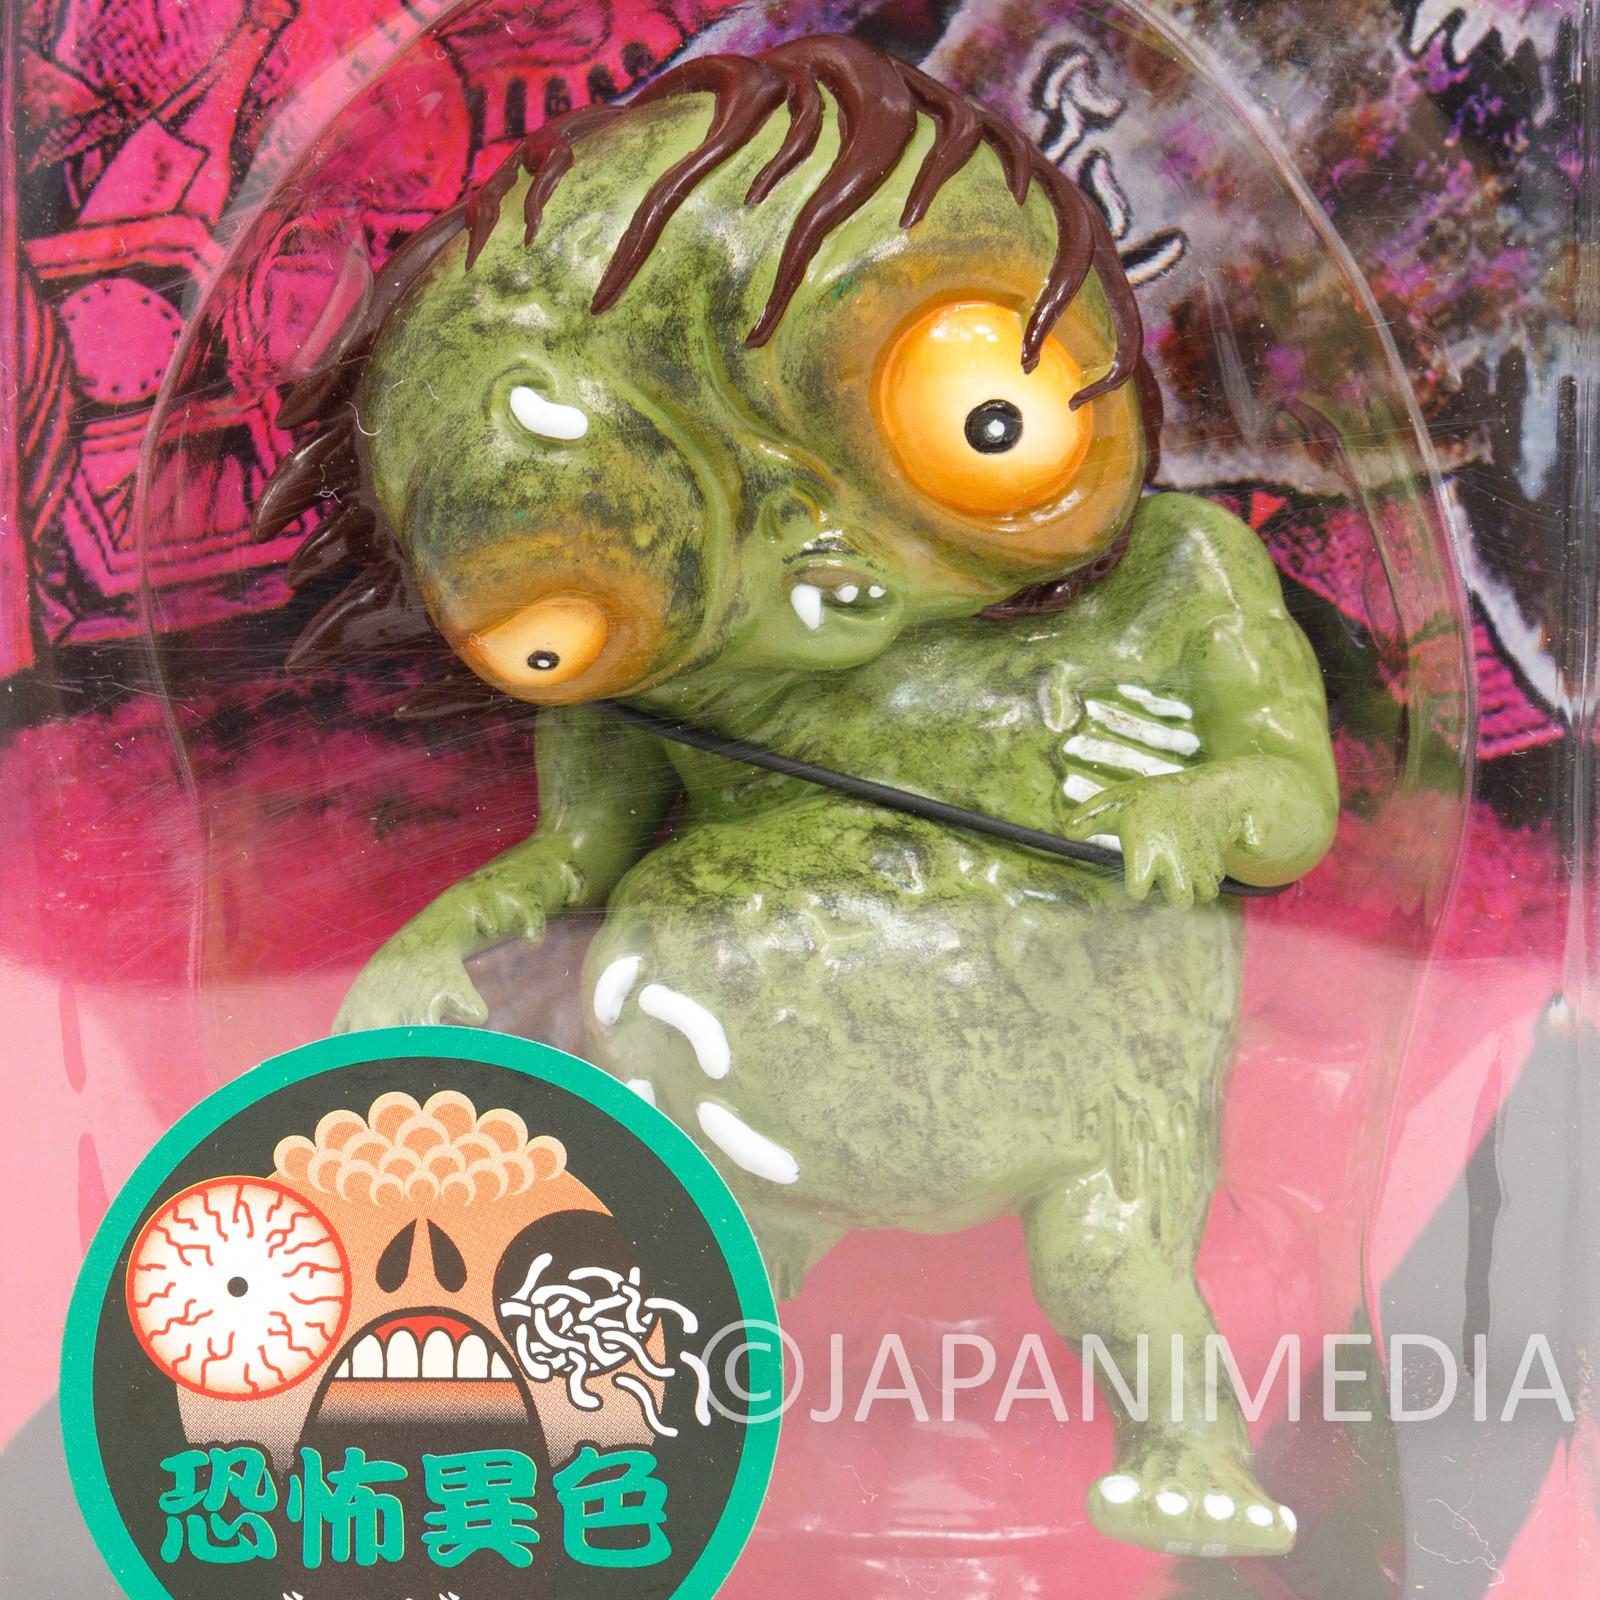 RARE! Jigoku Shoujo Hell Baby Figure Hideshi Hino Planet Toys JAPAN MANGA HORROR 3